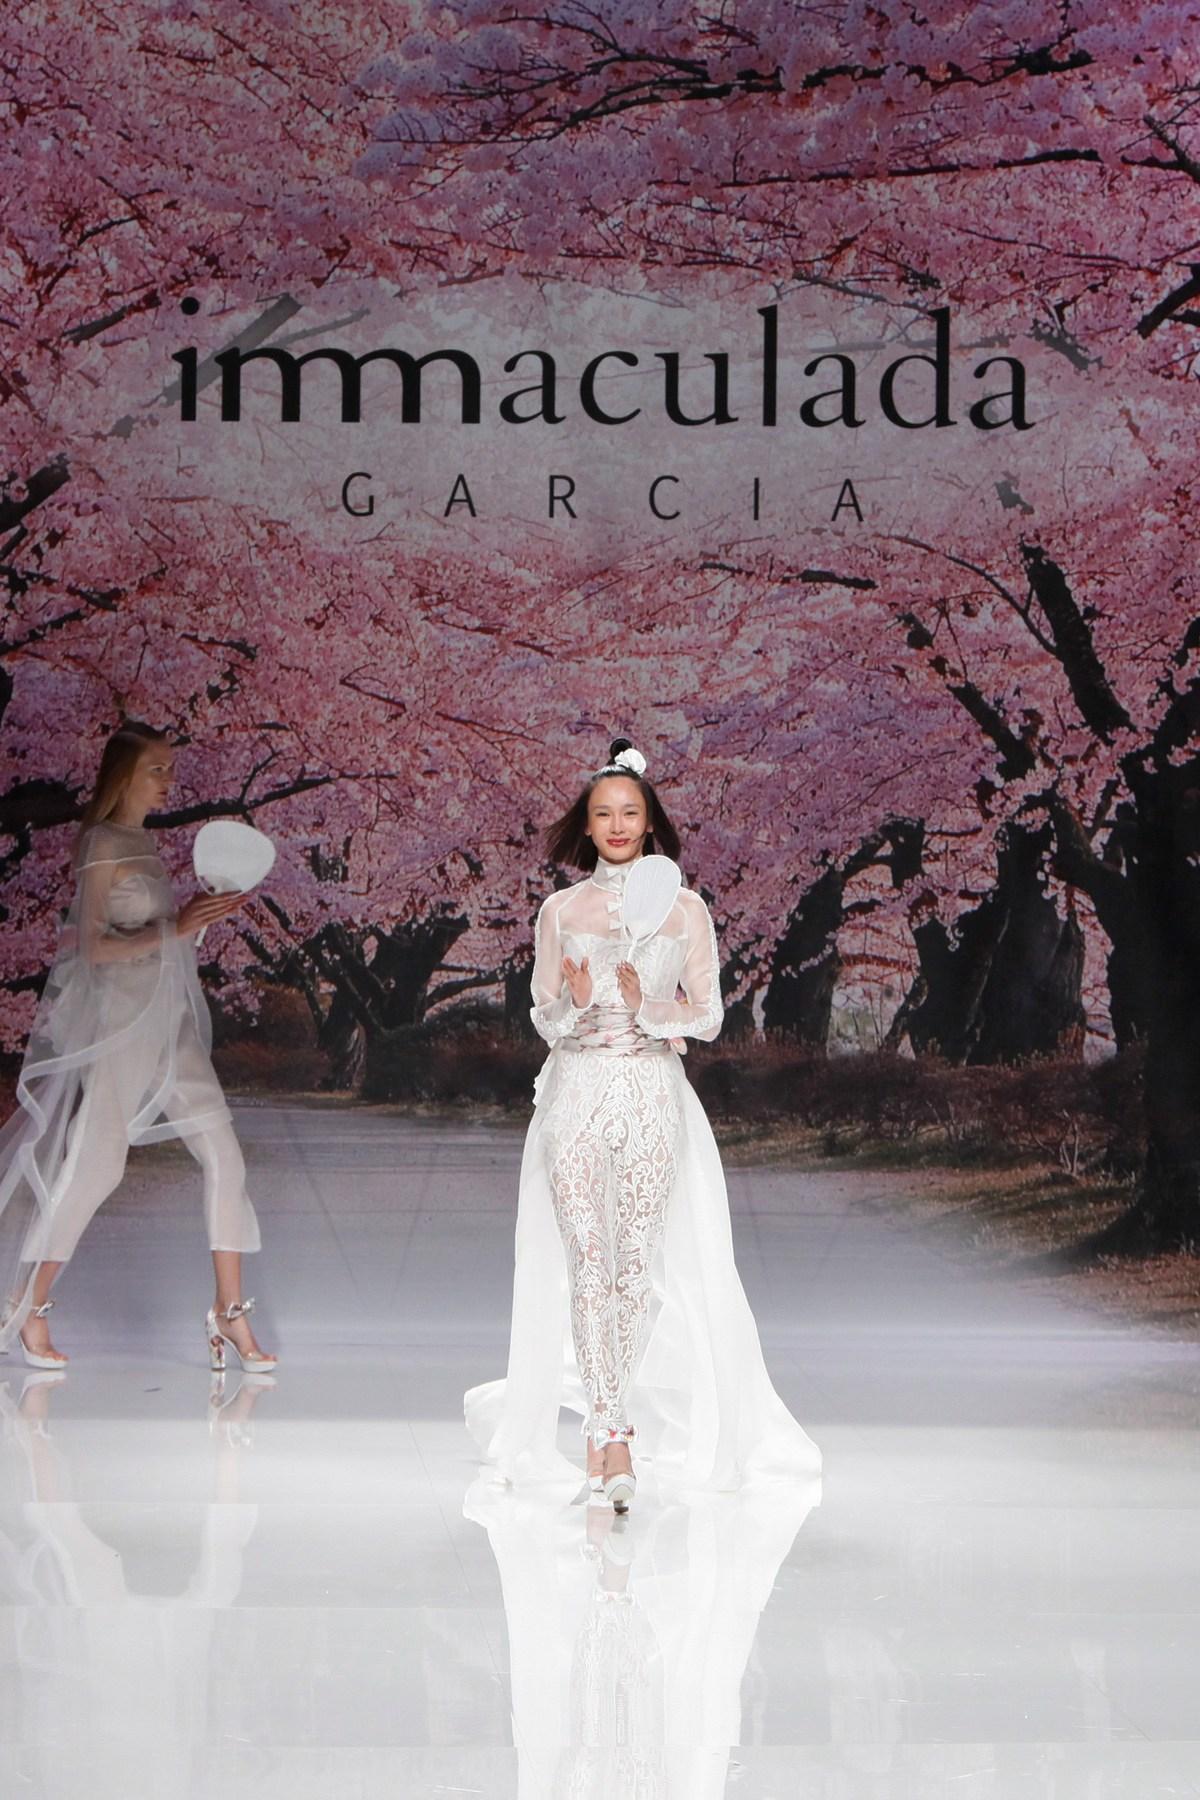 Inmaculada Garcia brd RS17 0773